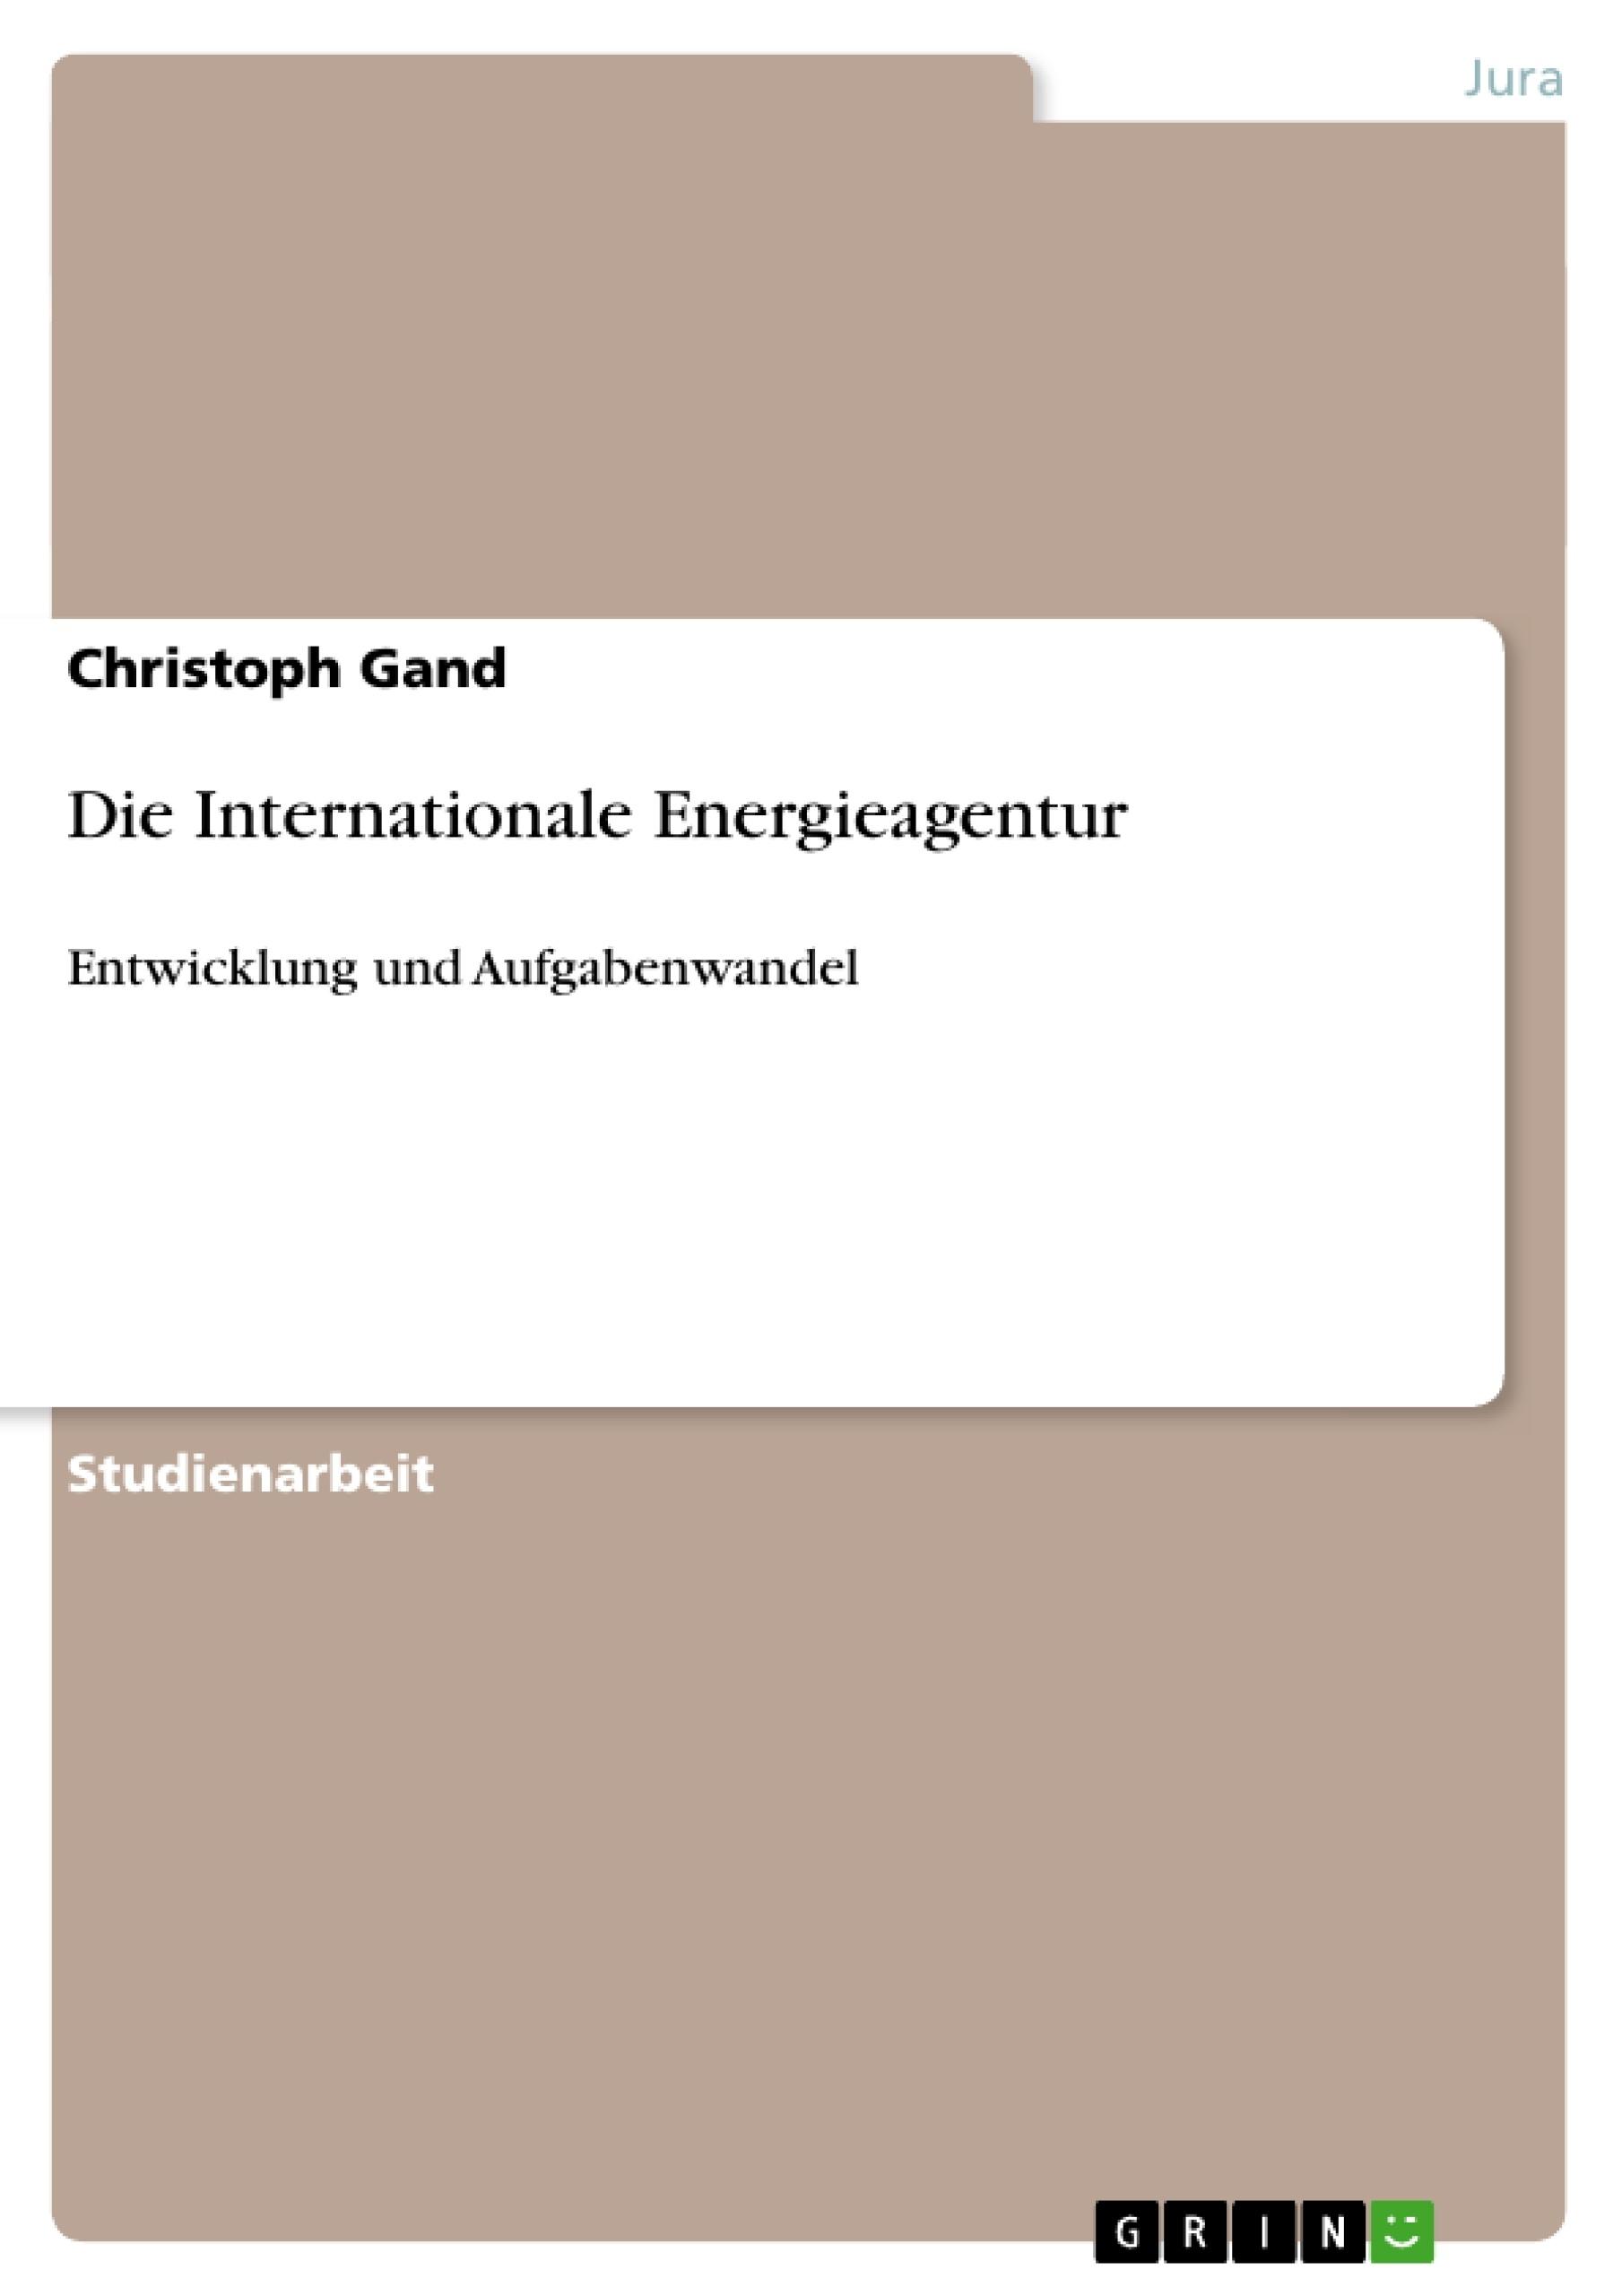 Titel: Die Internationale Energieagentur